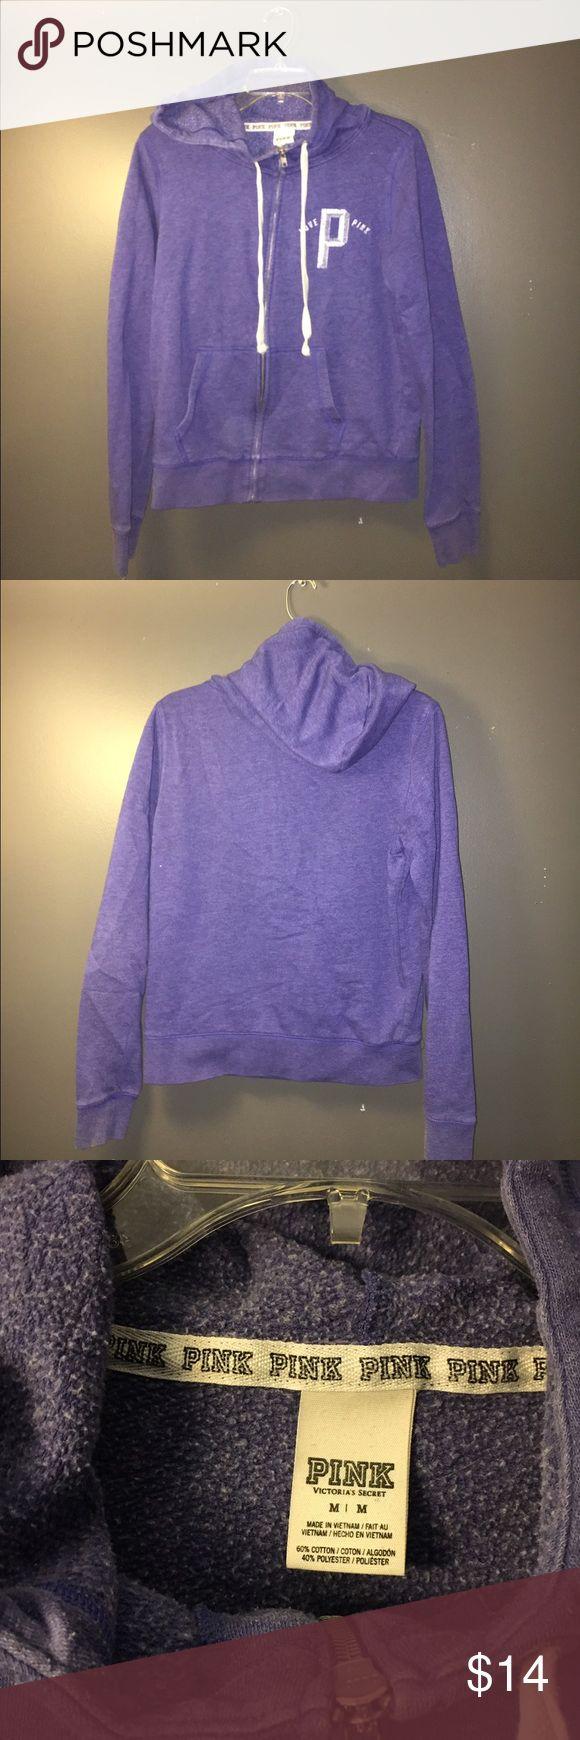 PINK purple zip up sweatshirt Very loved, but too big for me! Super cute and has no signs of wear PINK Victoria's Secret Tops Sweatshirts & Hoodies